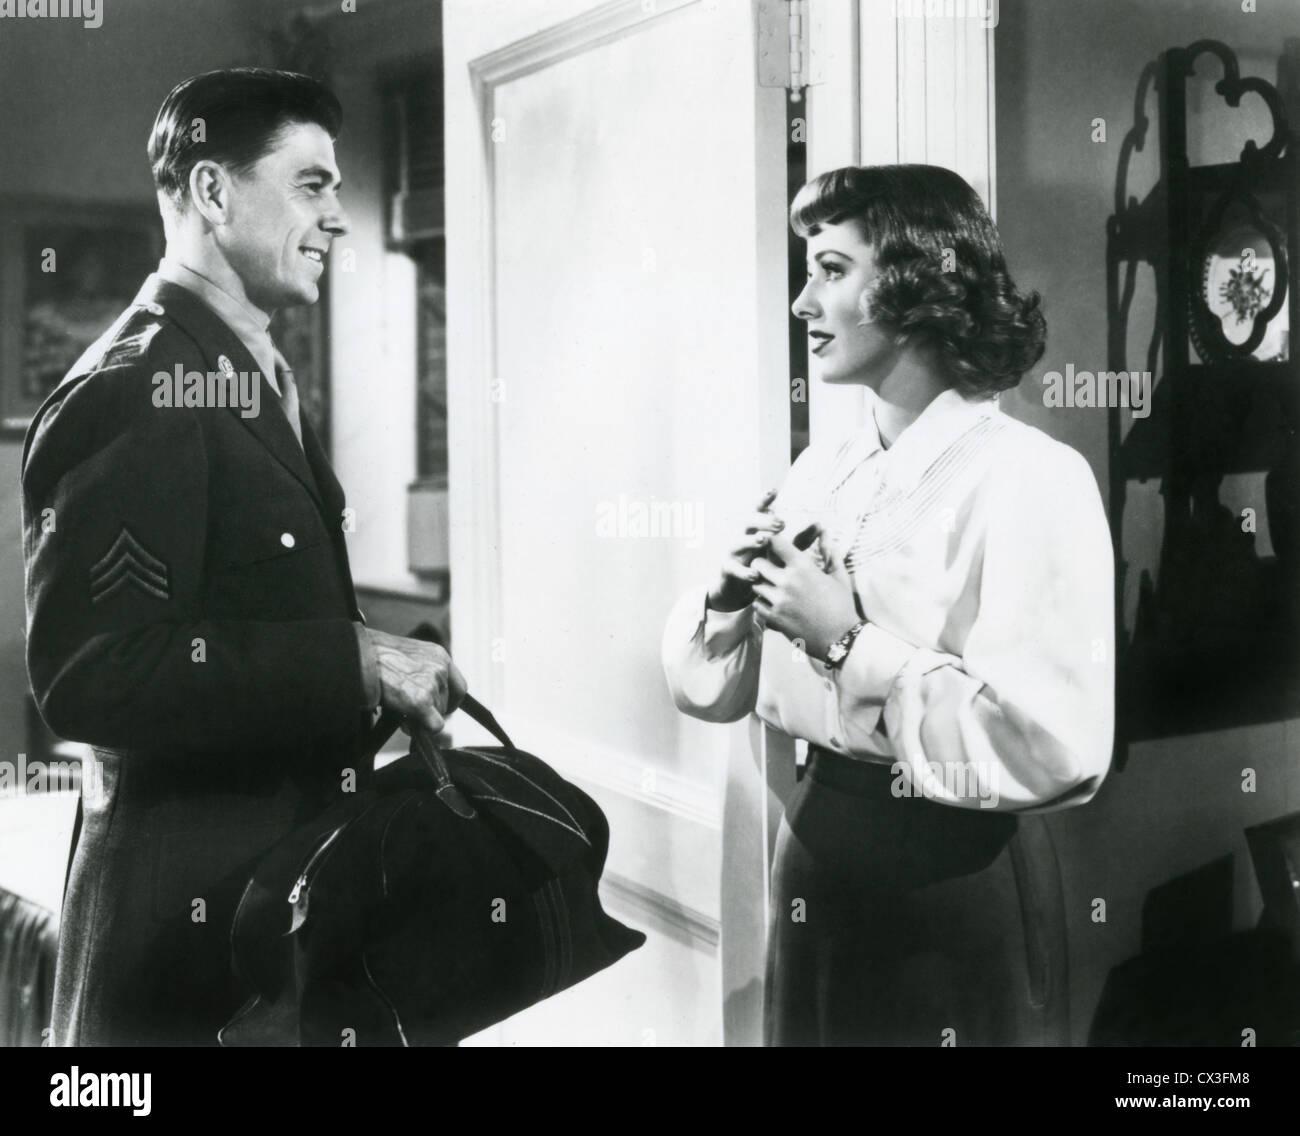 VOICE OF THE TURTLE (1948) RONALD REAGAN, ELEANOR PARKER IRVING RAPPER (DIR) VOTT 001 MOVIESTORE COLLECTION LTD - Stock Image